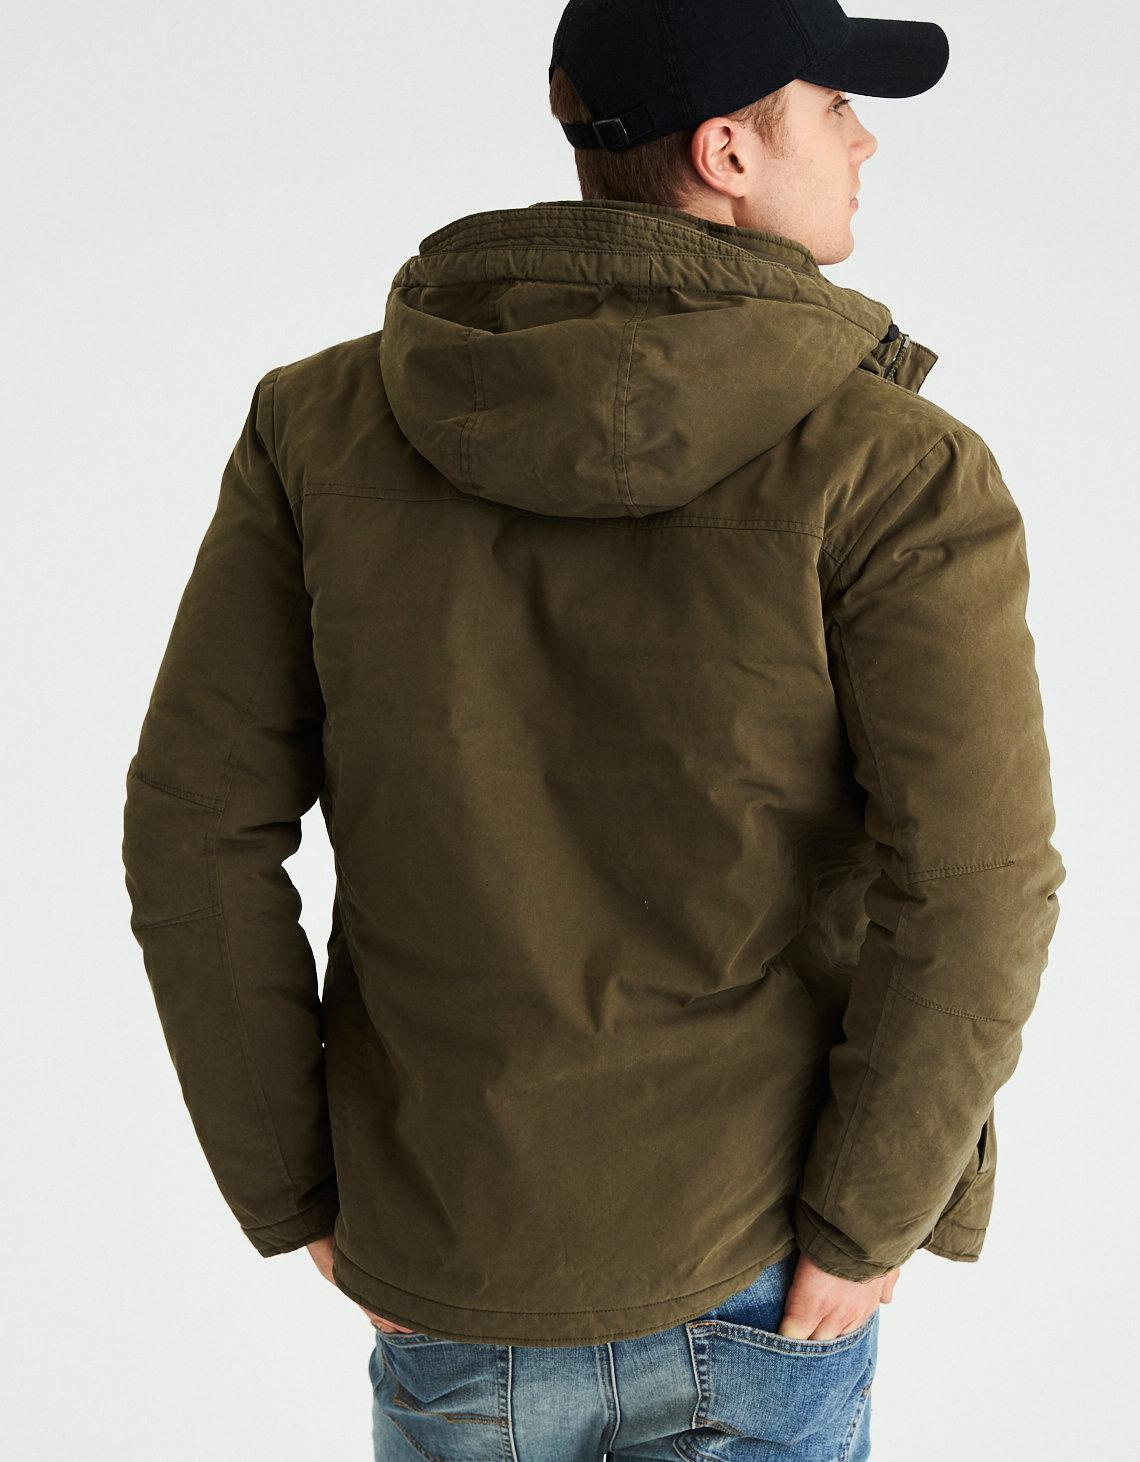 Ae Military Shirt Jacket